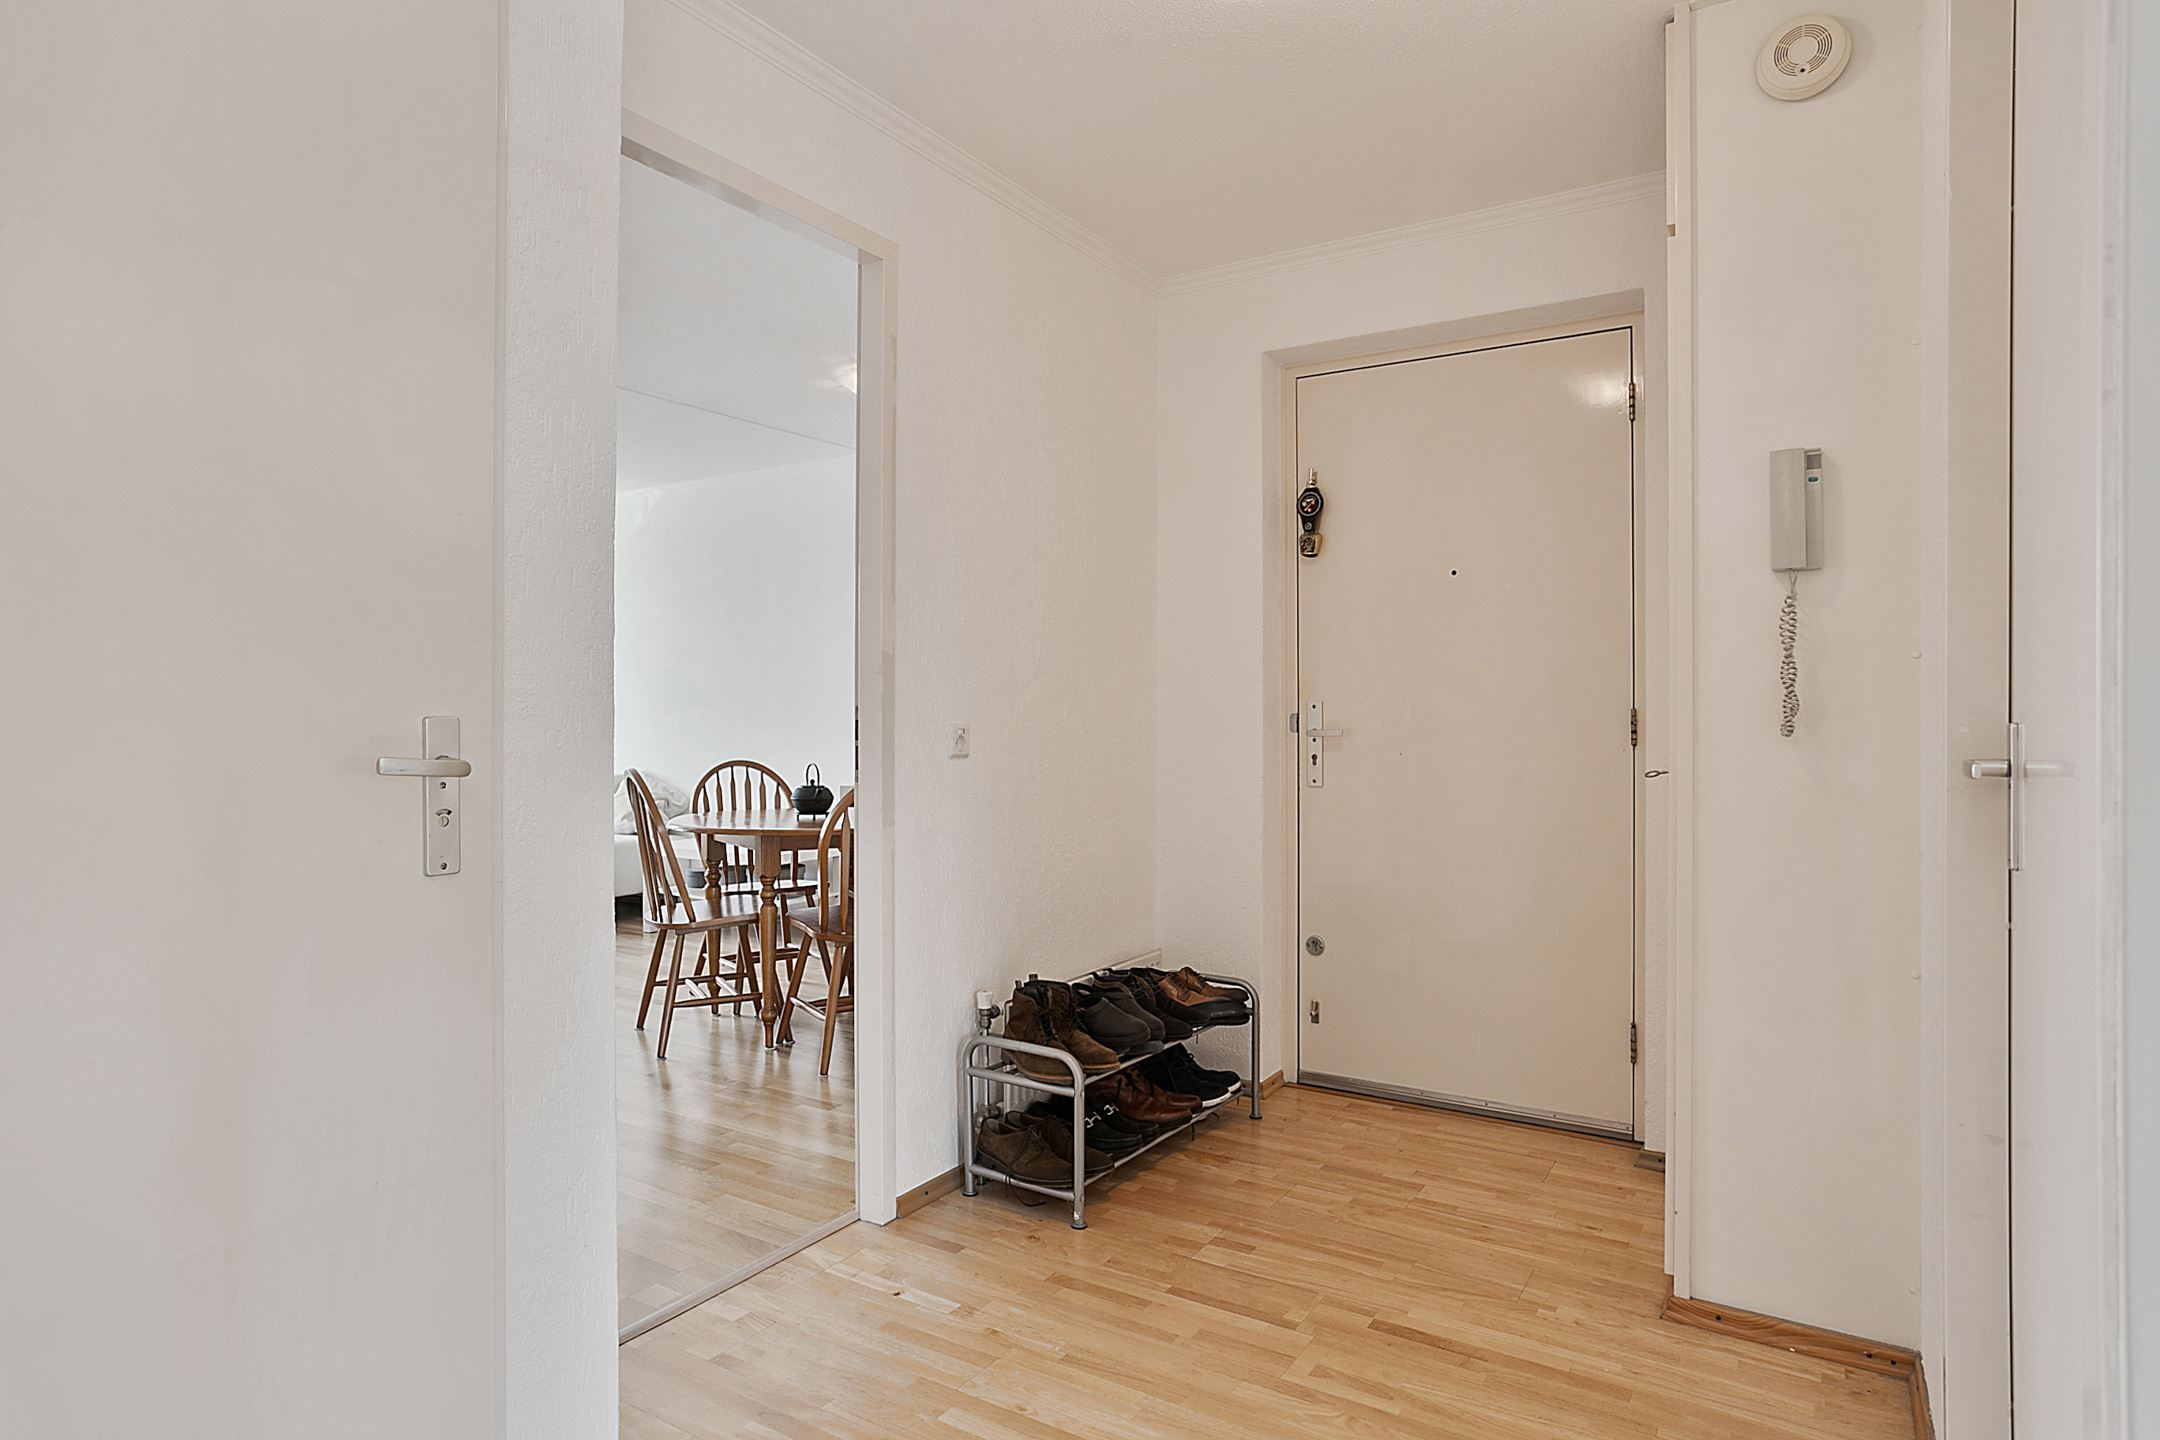 X2o Badkamer Ervaringen : Huis tuin pla badkamermeubel parksidetraceapartments